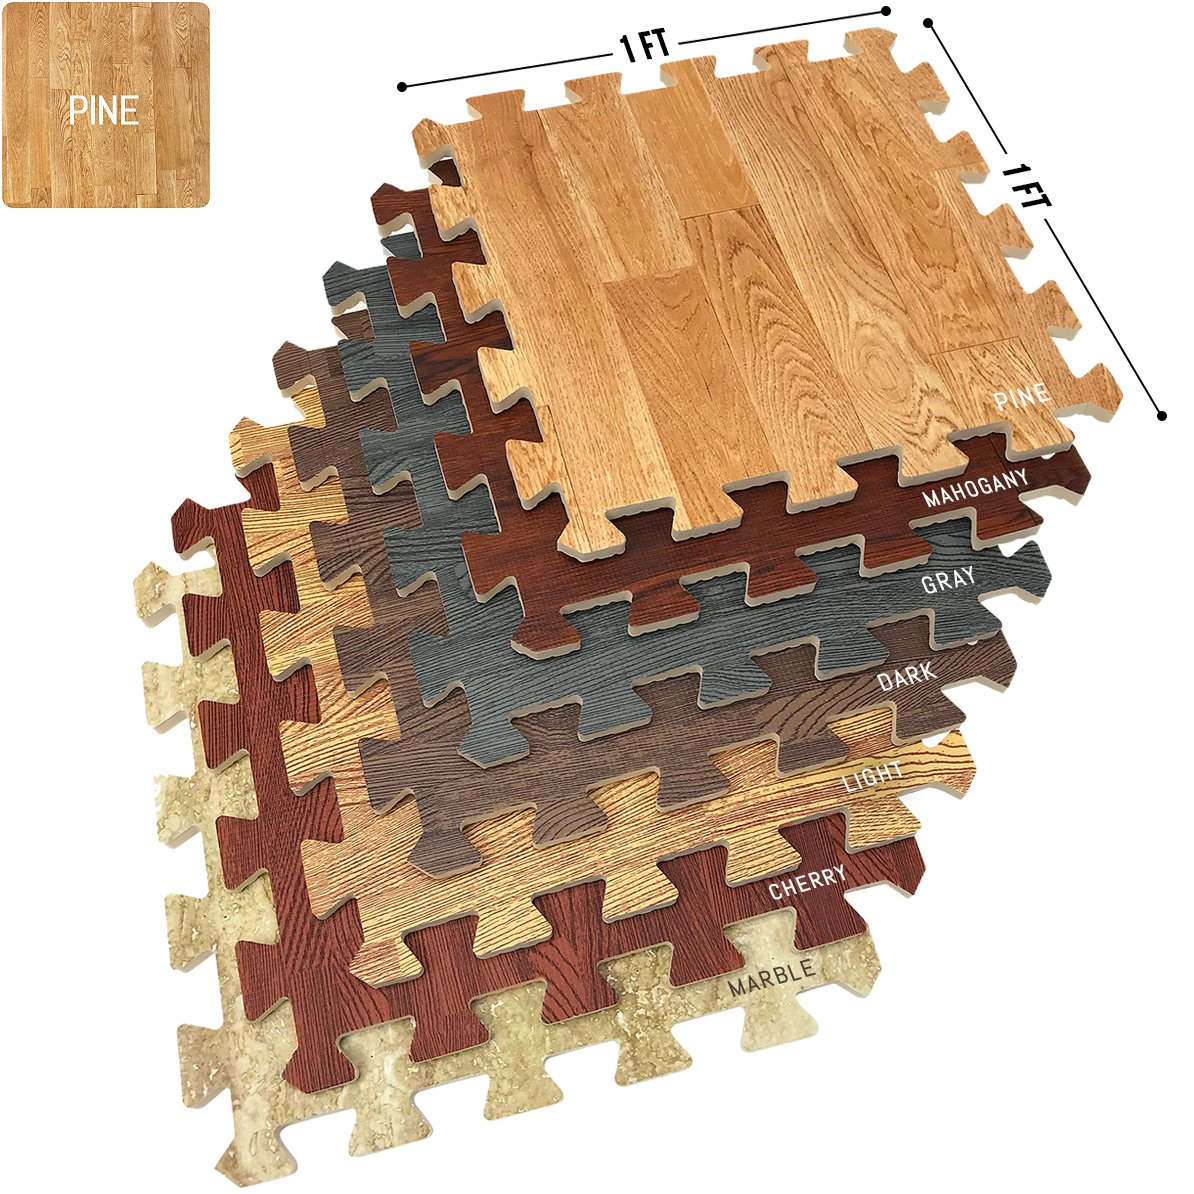 Sorbus Wood Grain Floor Mats Foam Interlocking Mats Each Tile 1 Square Foot 3/8-Inch Thick Flooring Wood Mat Tiles - Home Office Playroom Basement Trade Show (12 Tiles,12 Sq ft, Wood Grain - Pine)